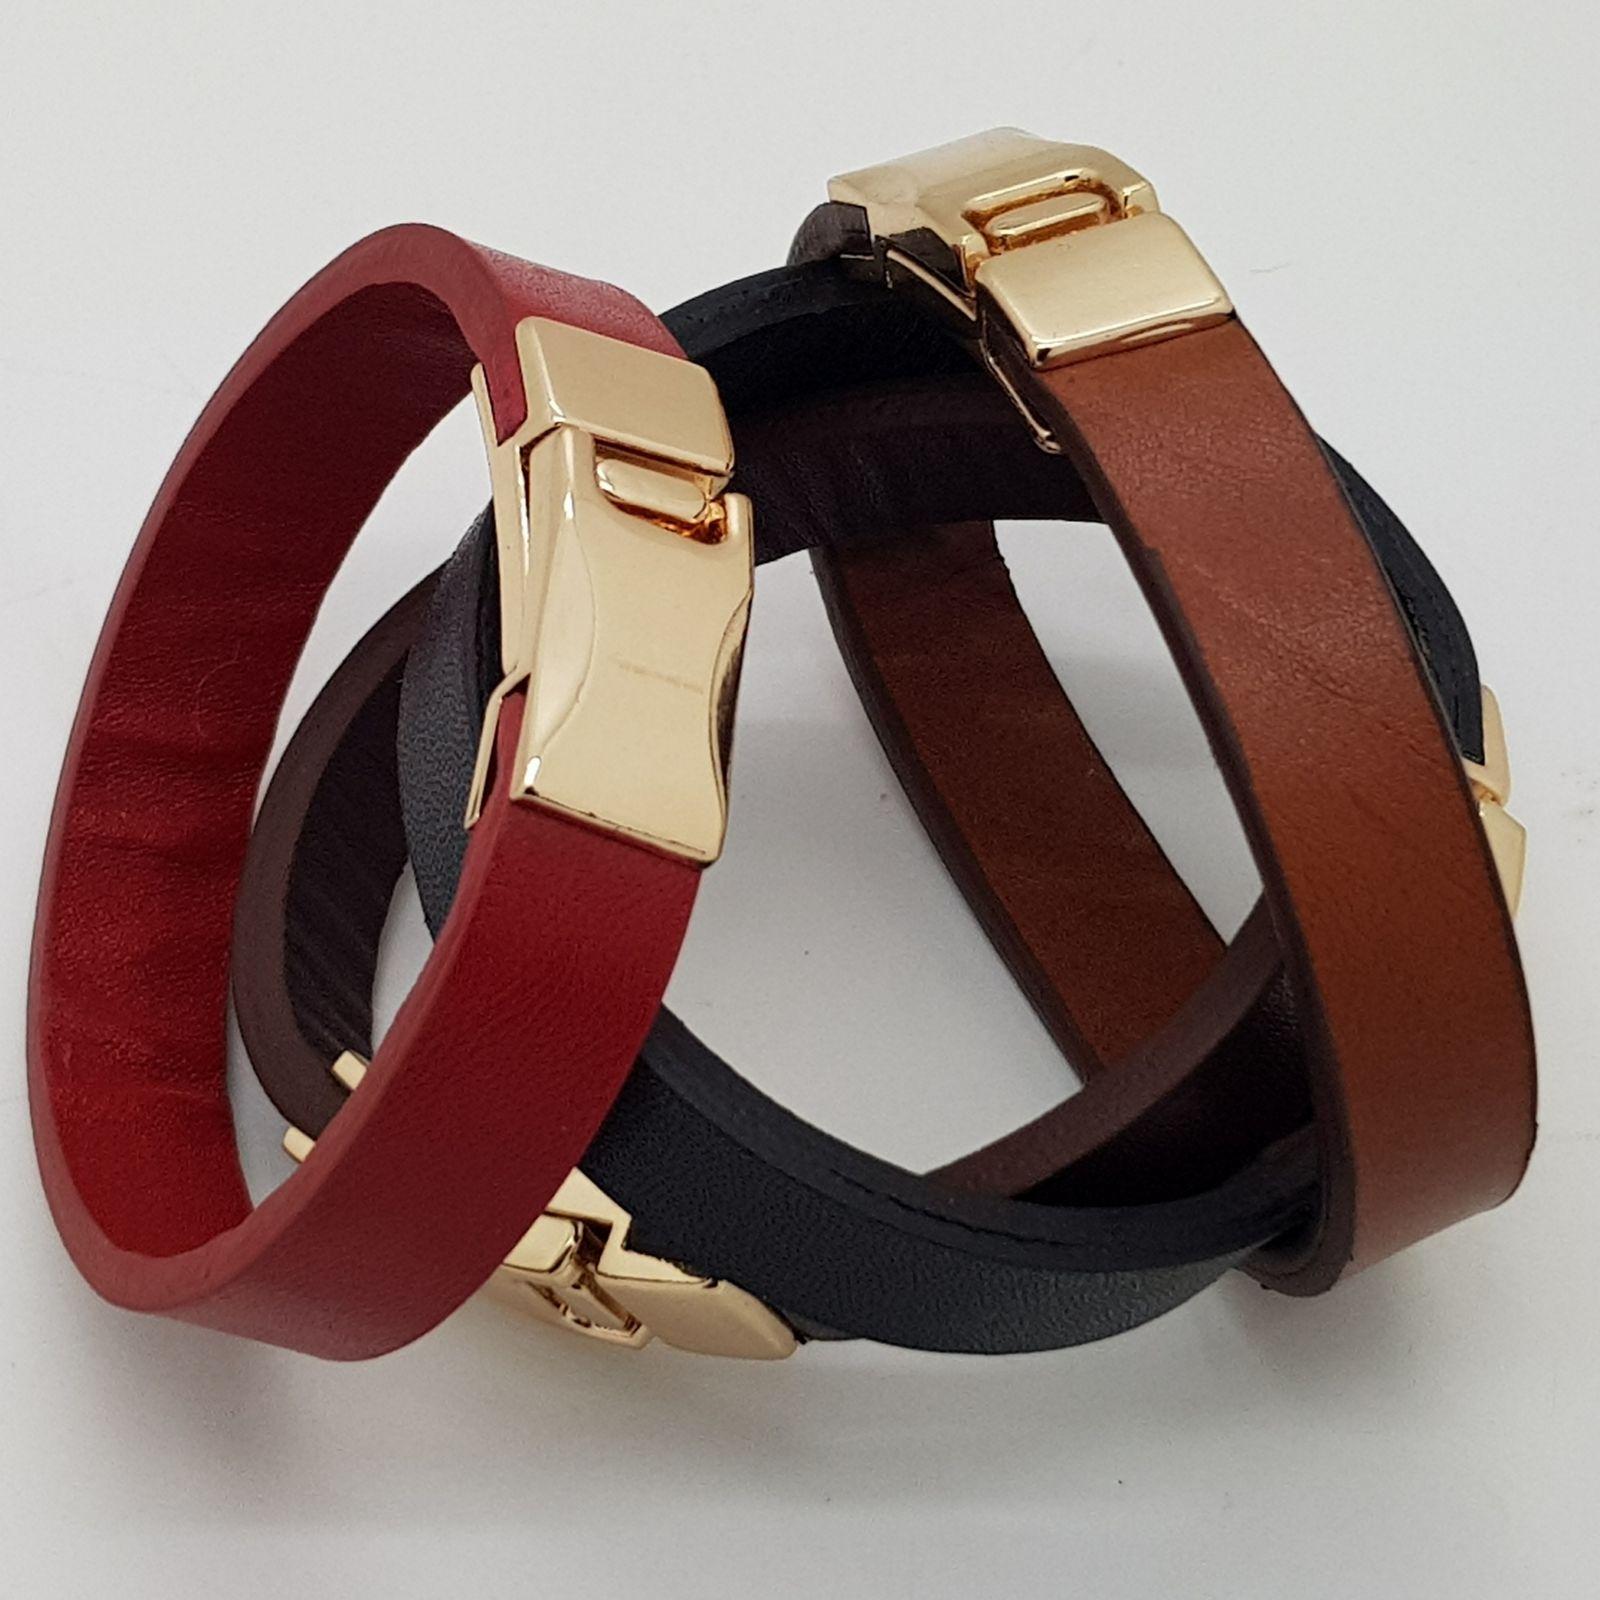 دستبند کد ۱۲۰ thumb 2 1